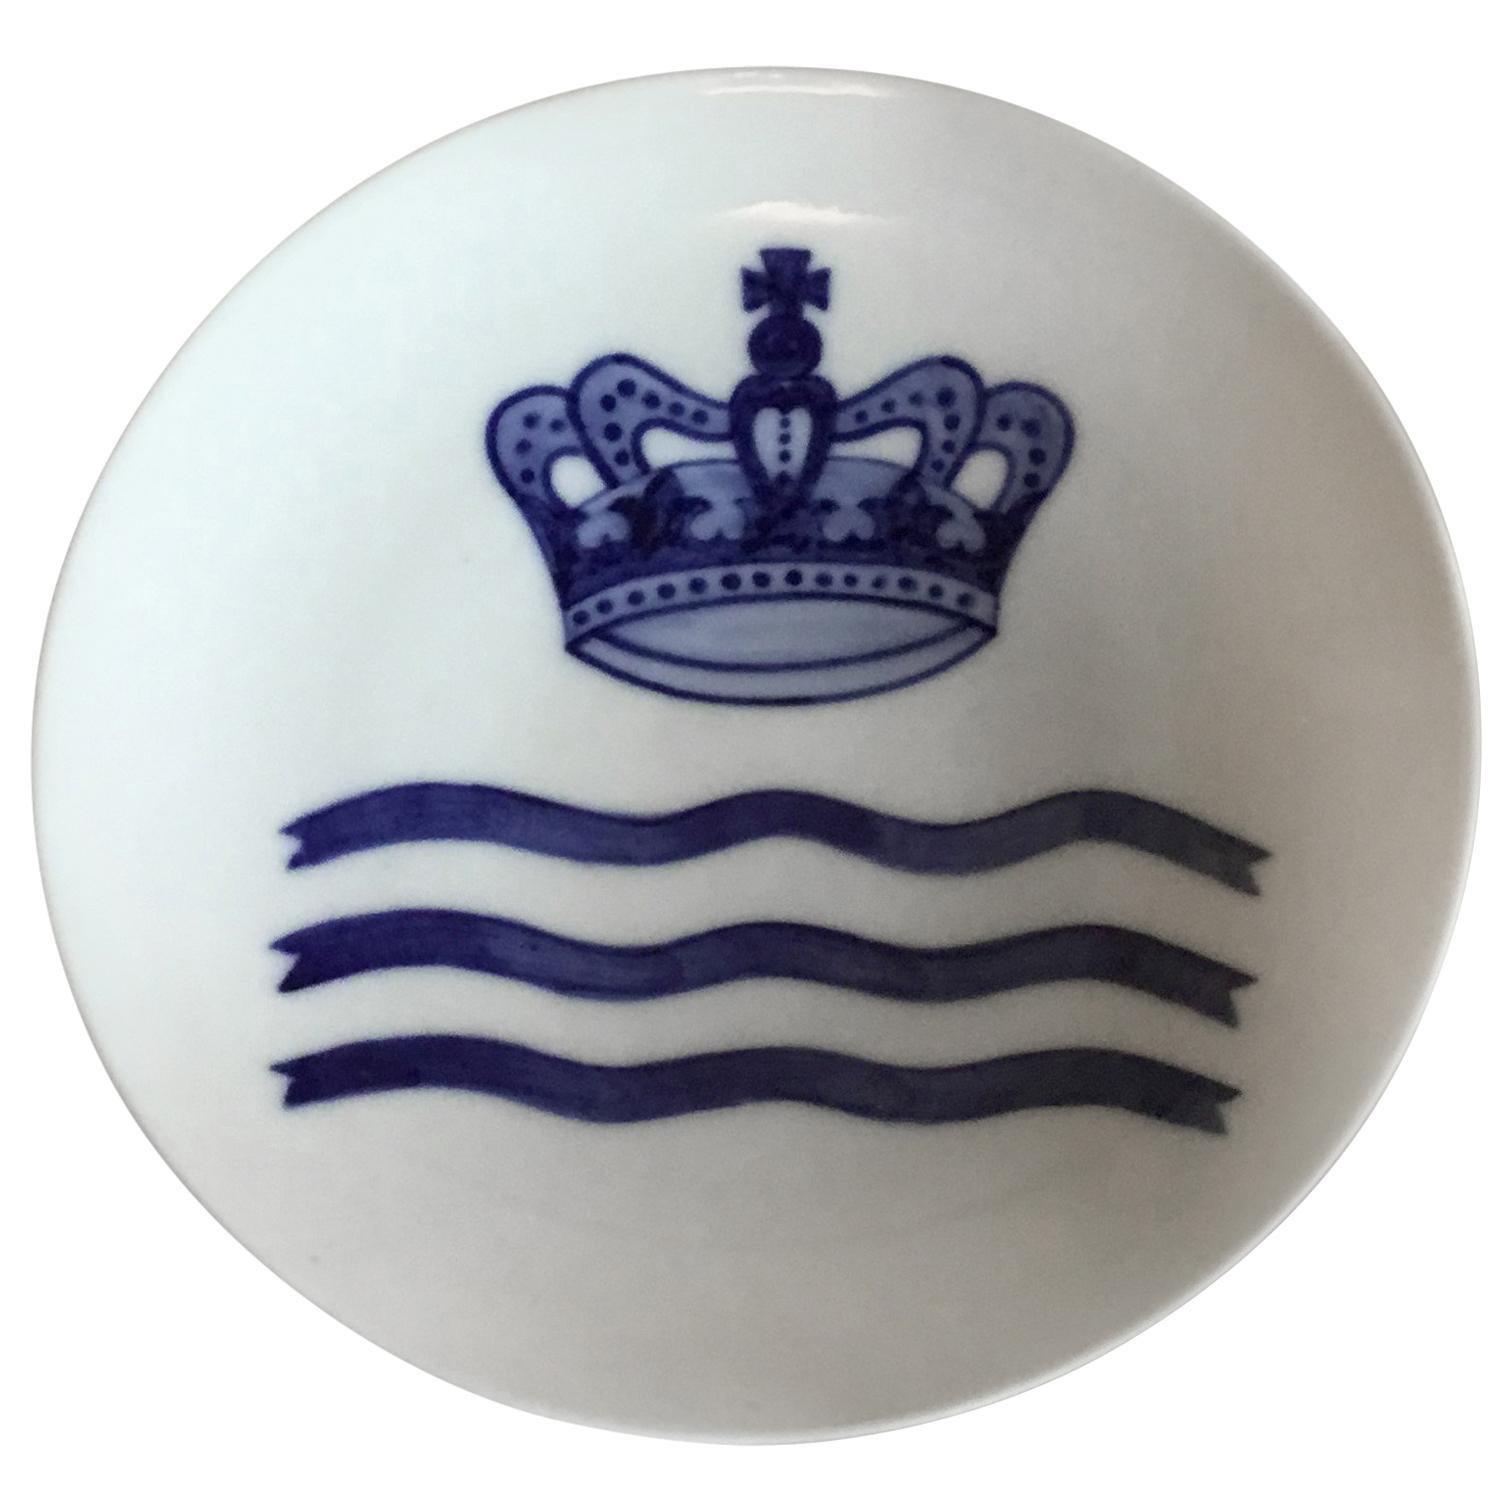 Royal Copenhagen Commemorative Plate from 1888 RC-CM001